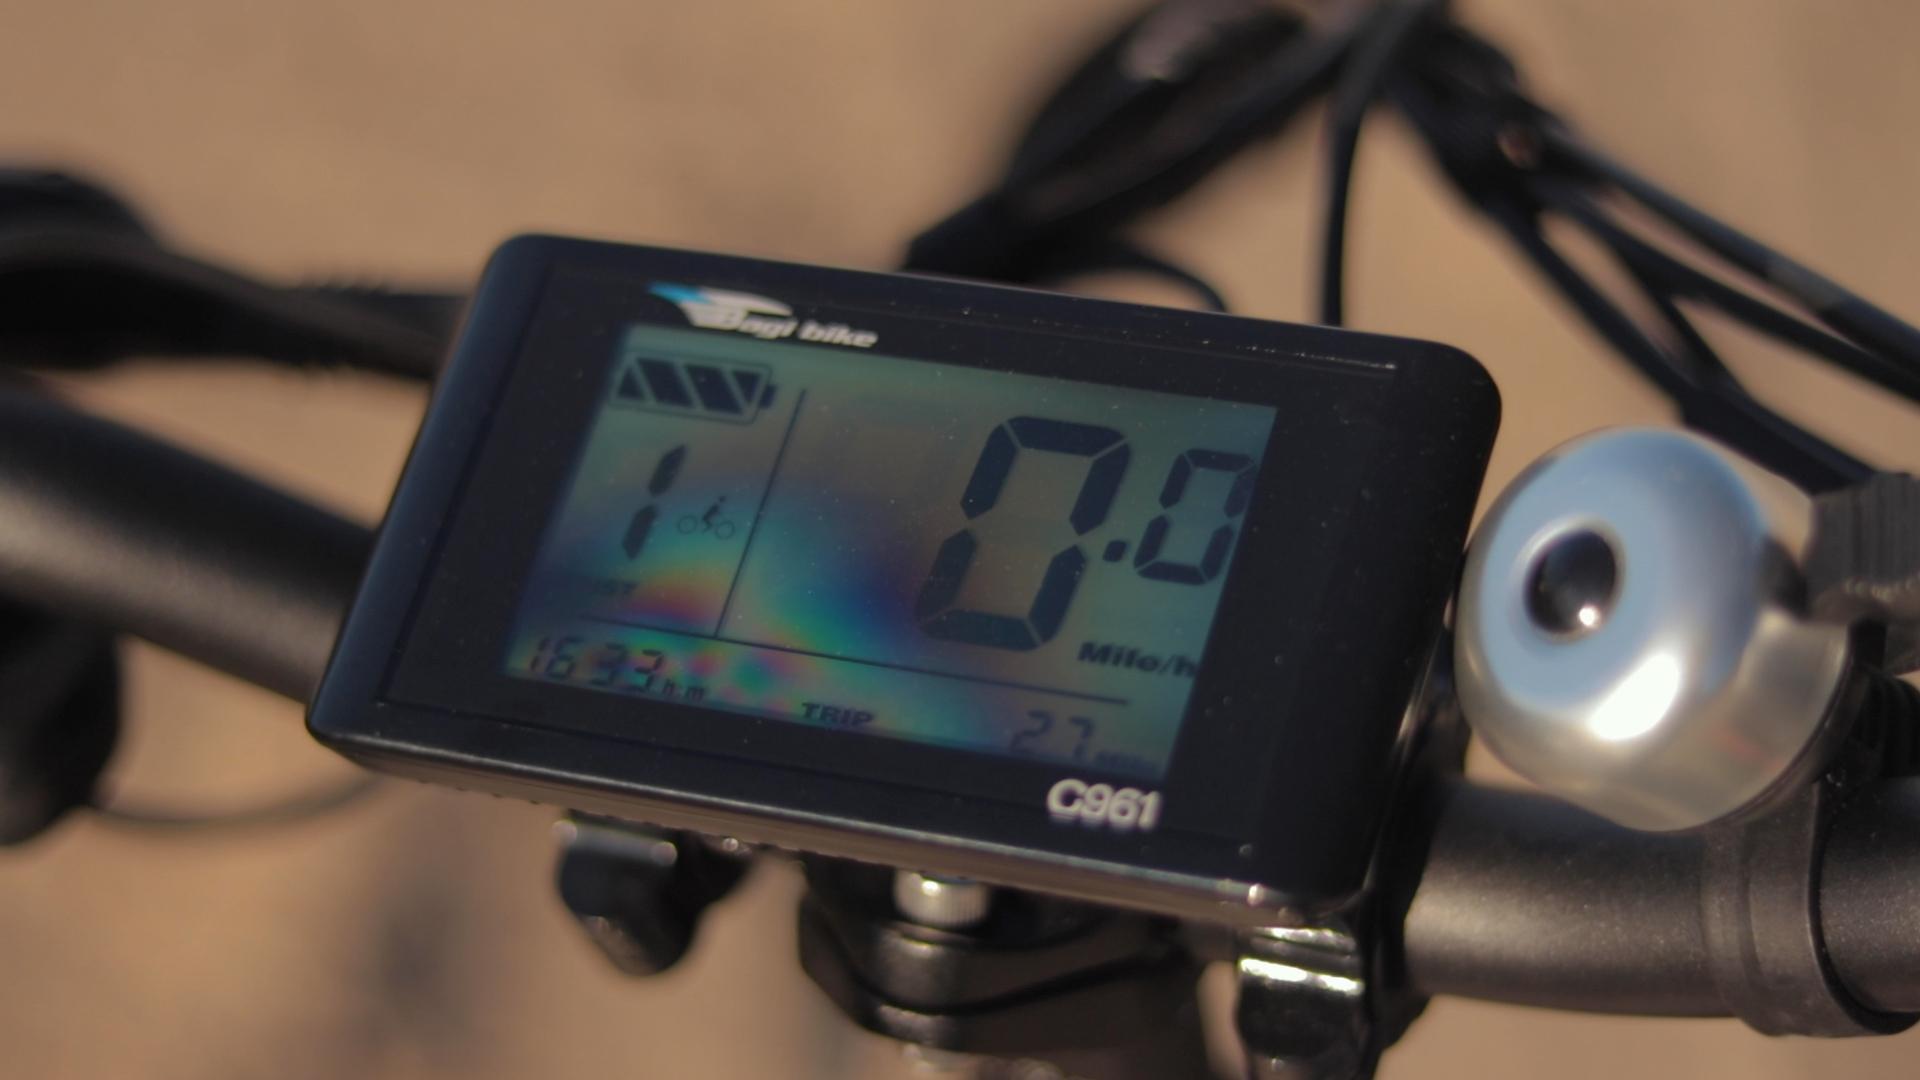 electrified-reviews-bagibike-b20-premium-electric-bike-review-bafangc961-display.jpg